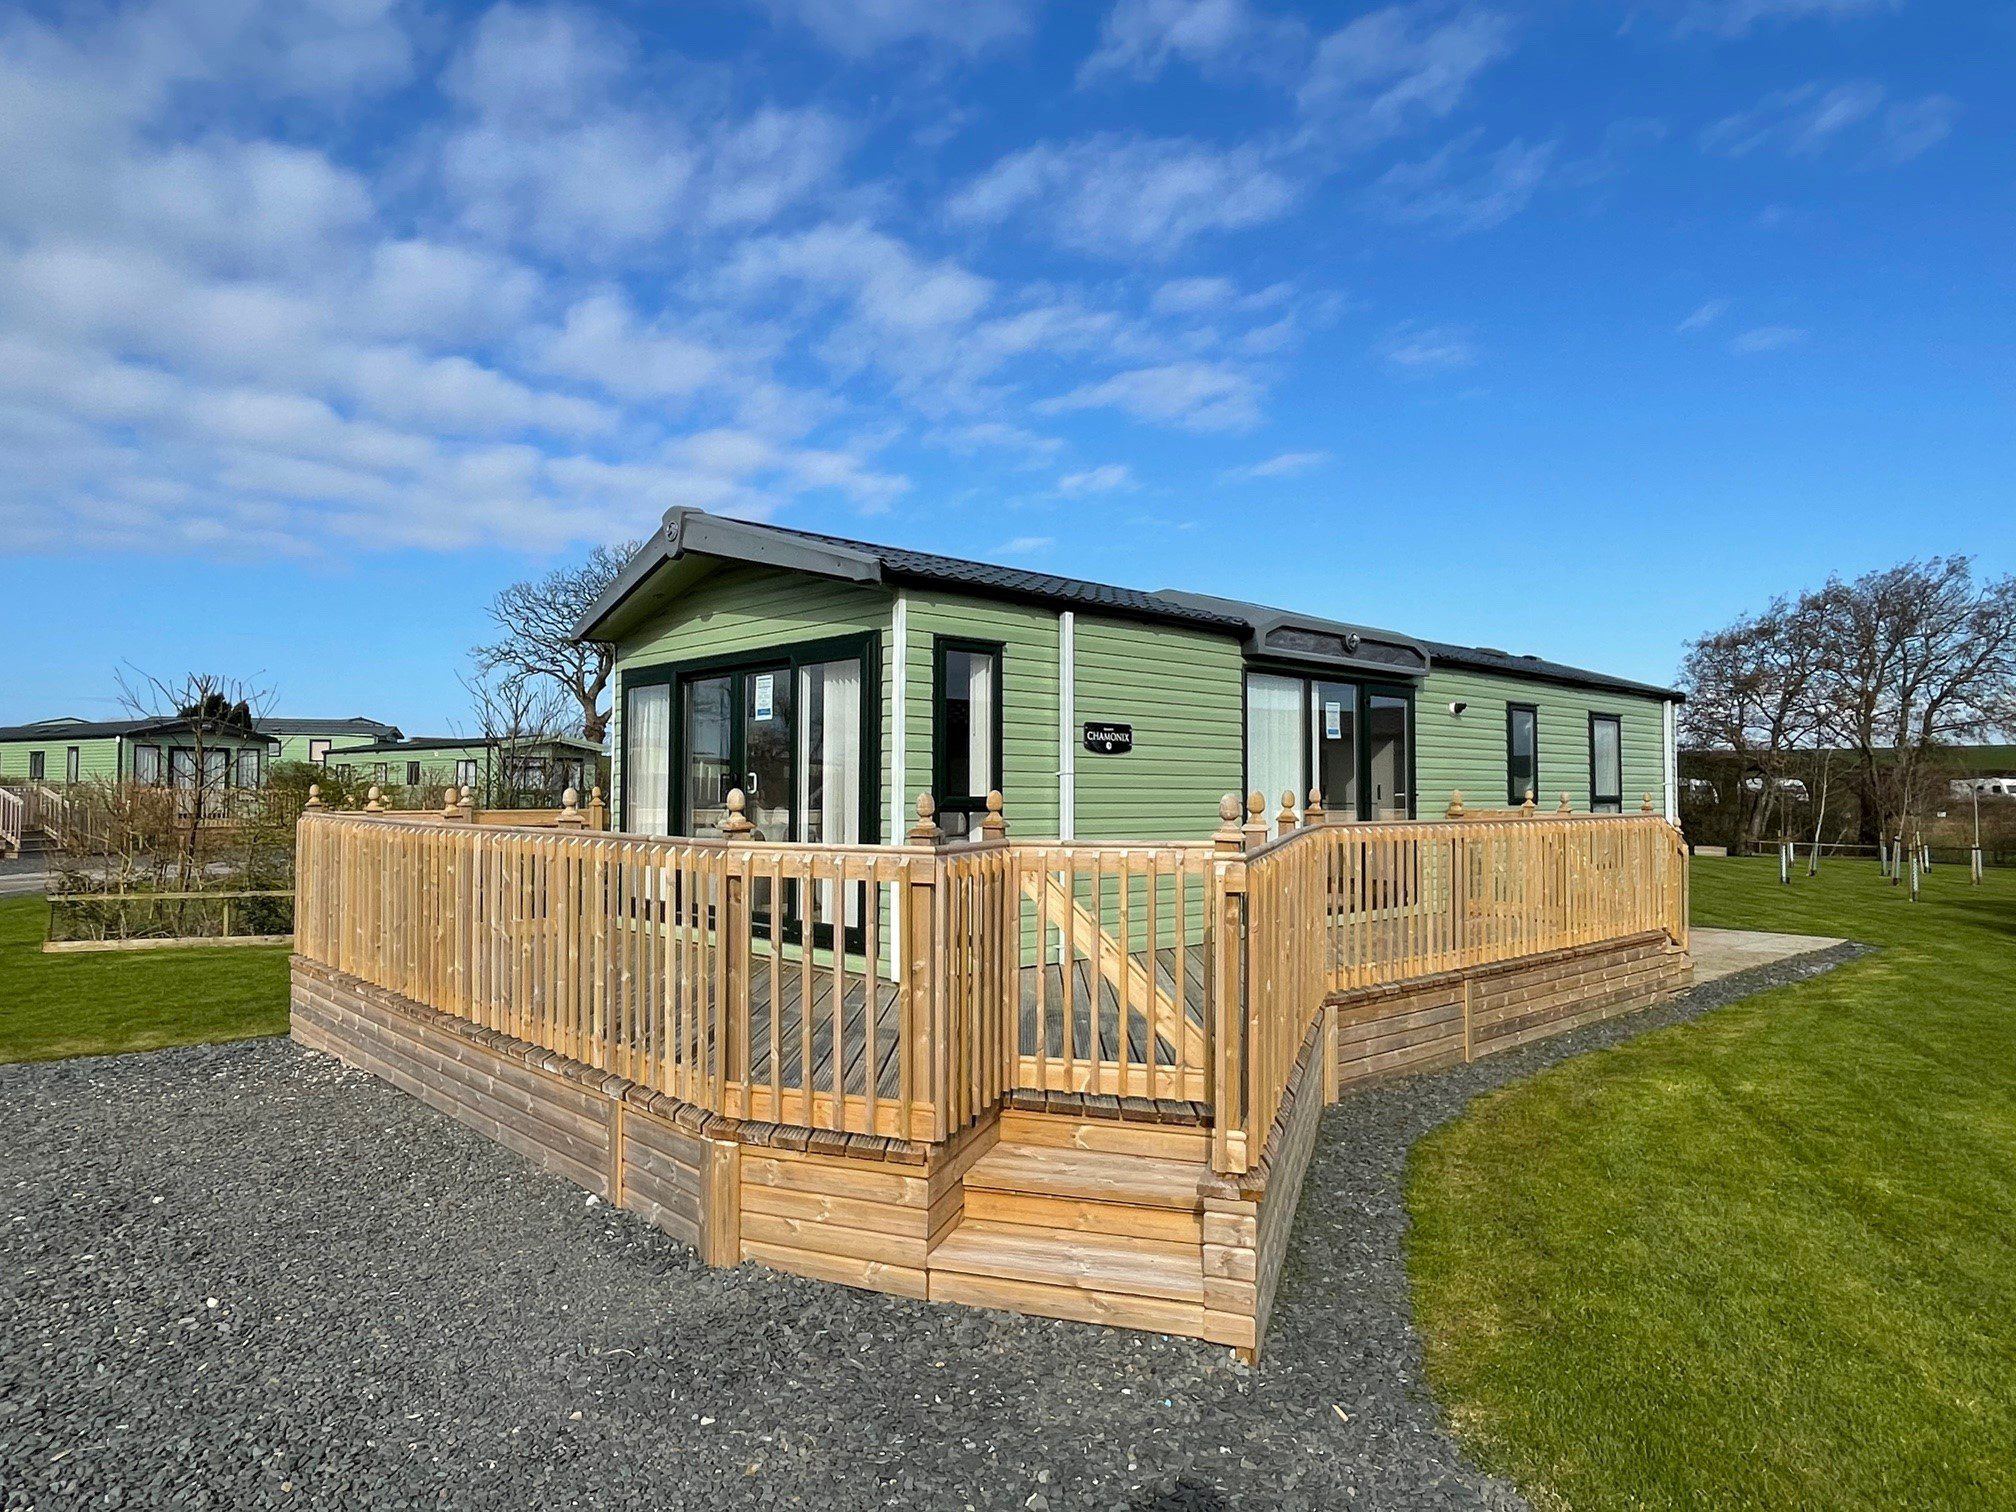 Previously Owned 2015 Swift Chamonix at Bay View Holiday Park North West Morecambe Bay (1)